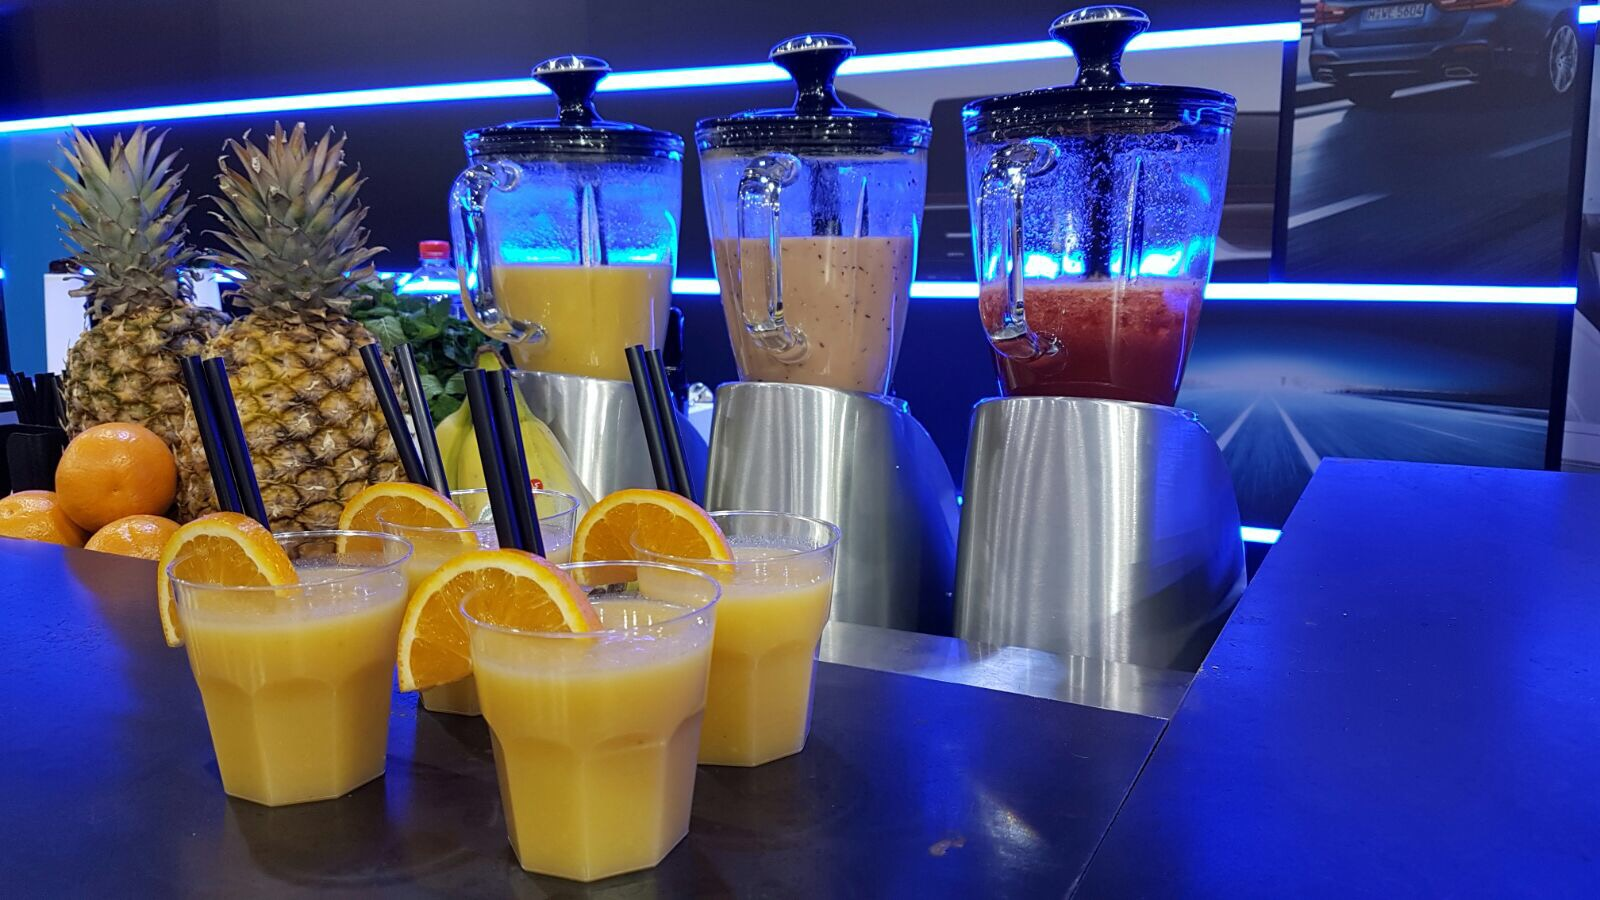 smoothie bar, Smoothie bar